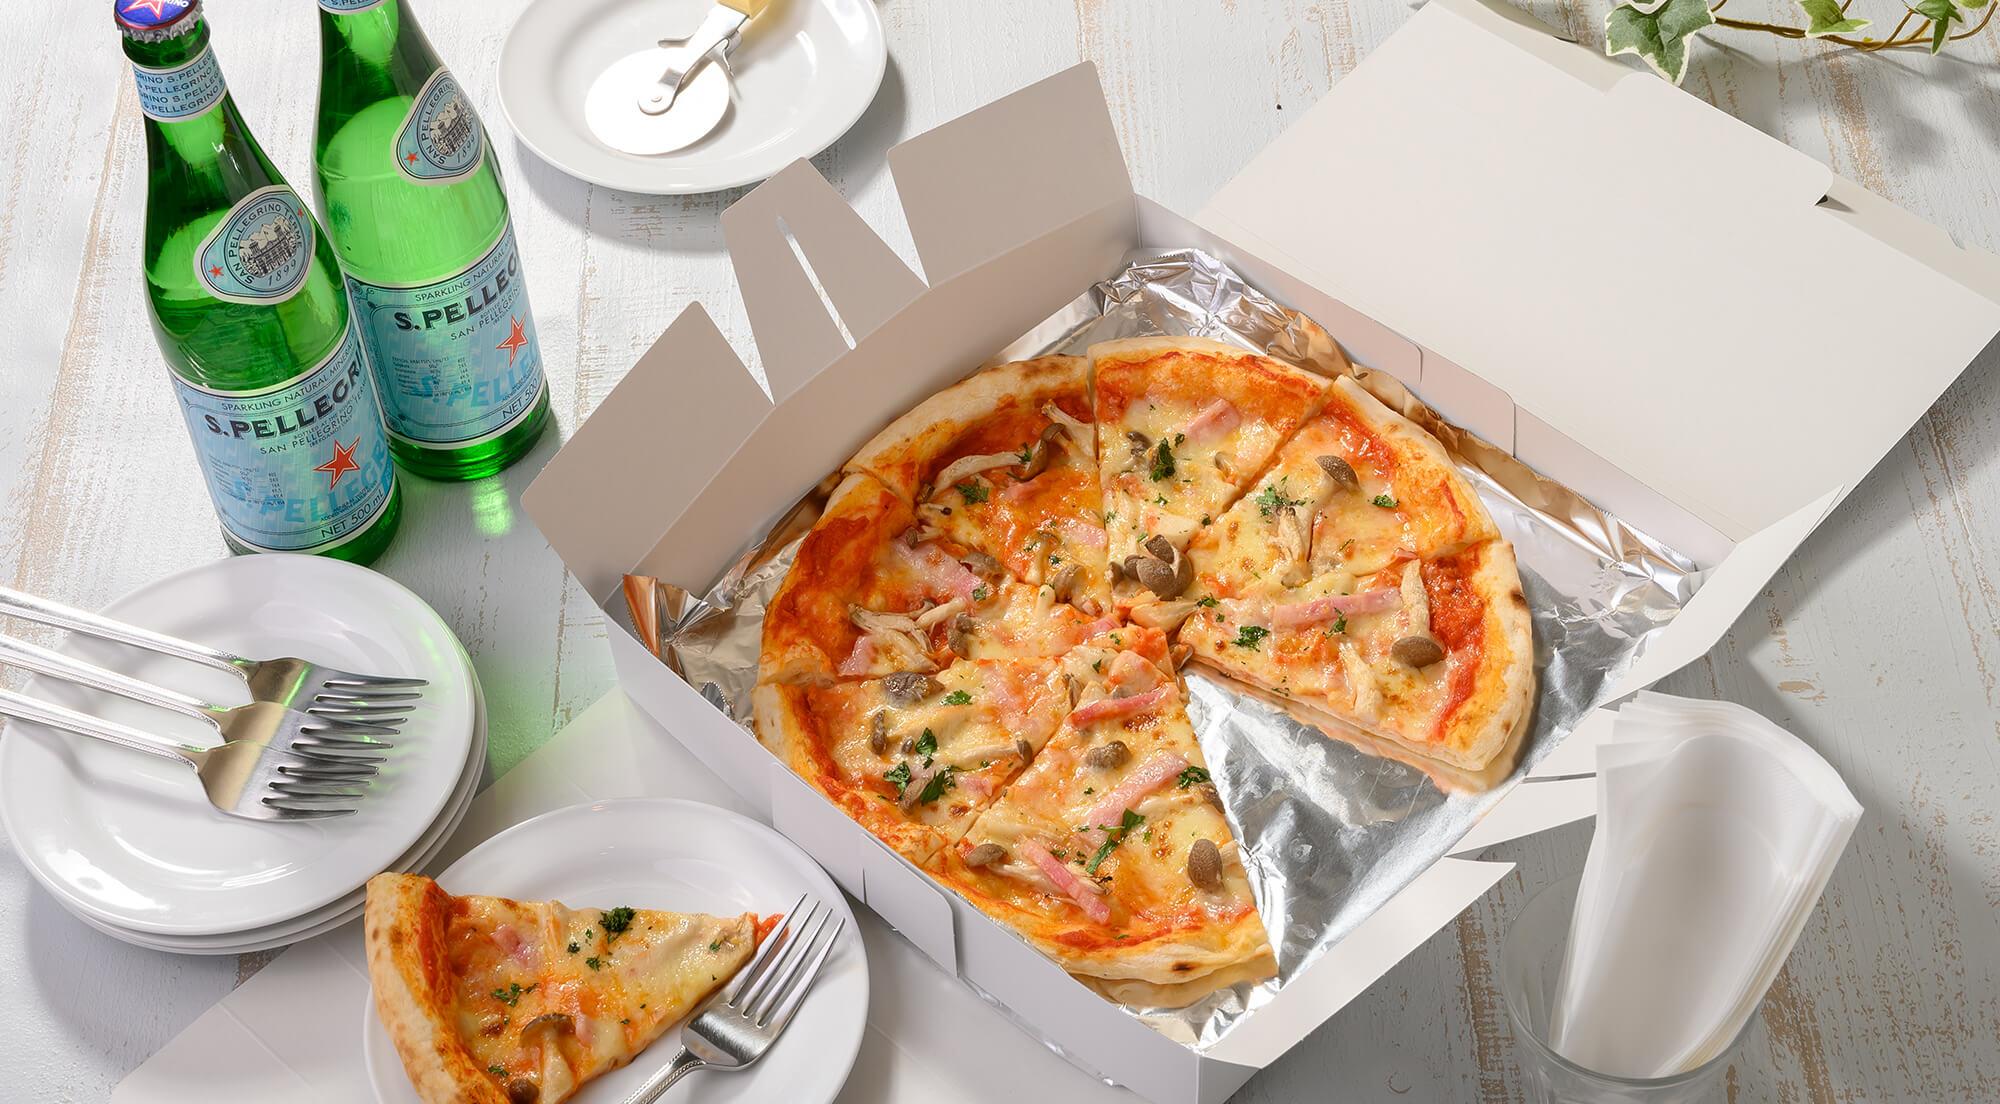 RISTORANTE mica maleの自慢のイタリア料理、ピザの画像